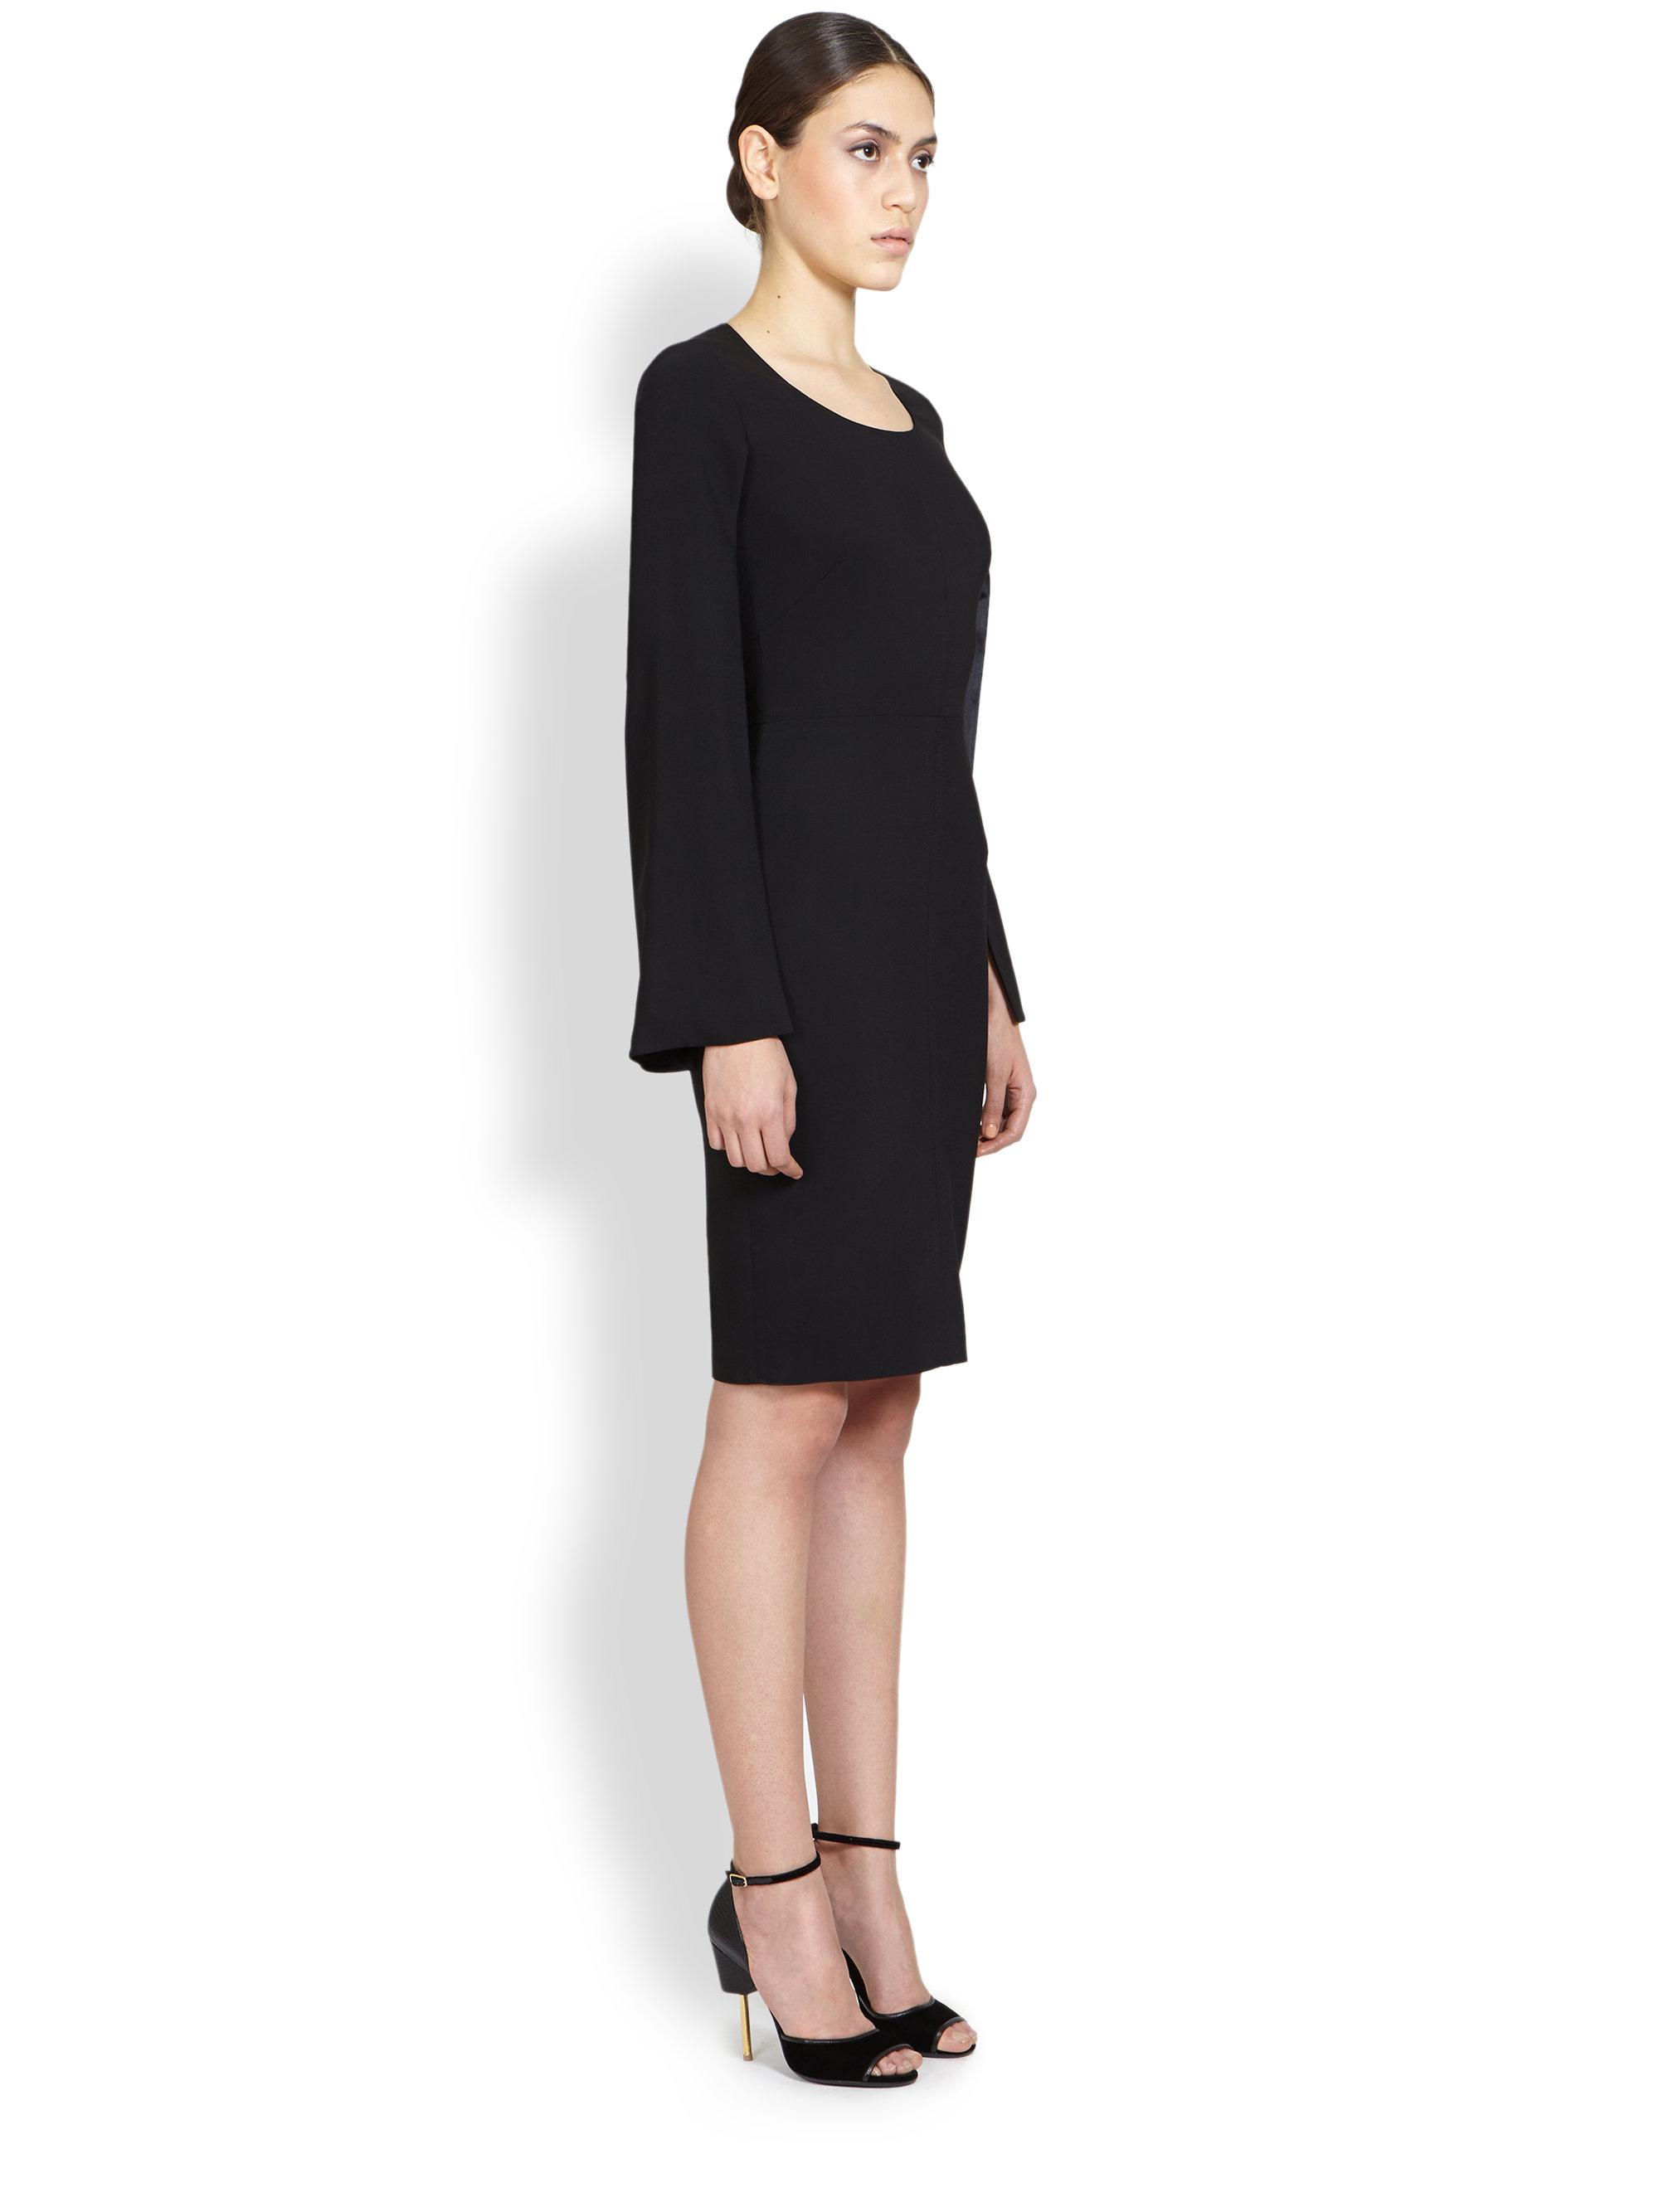 Womens Studded Mesh & Cady Minidress Givenchy sxnez7DeNC